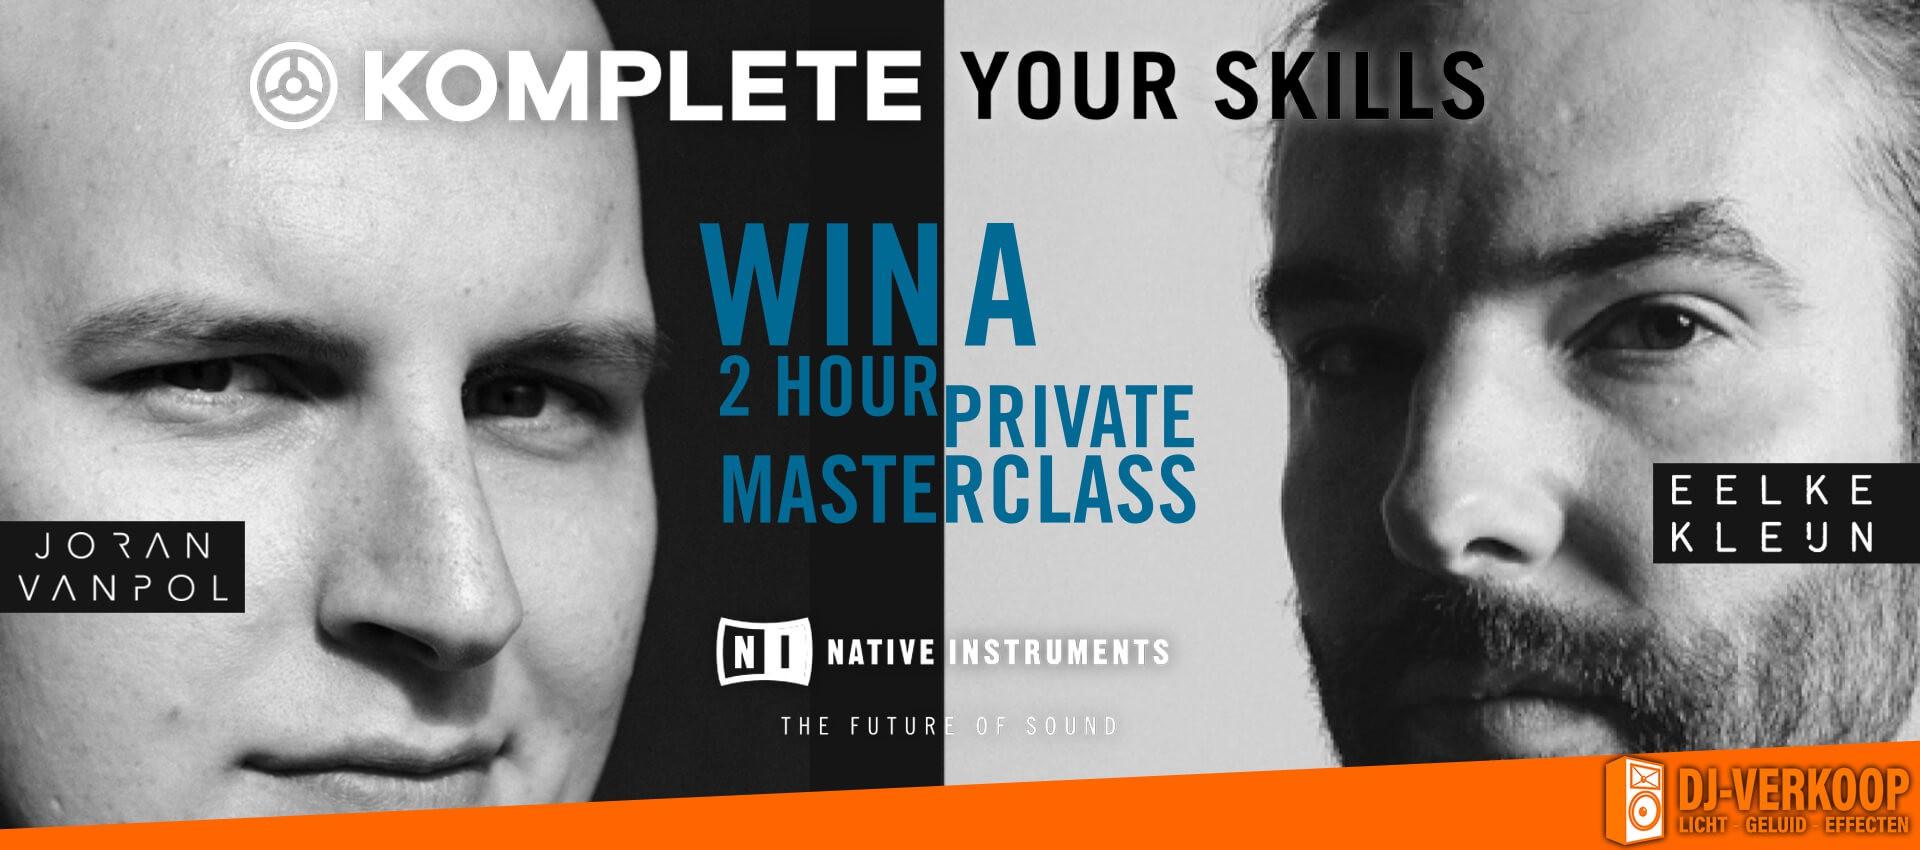 Native Instruments KOMPLETE Your Skills Promotie